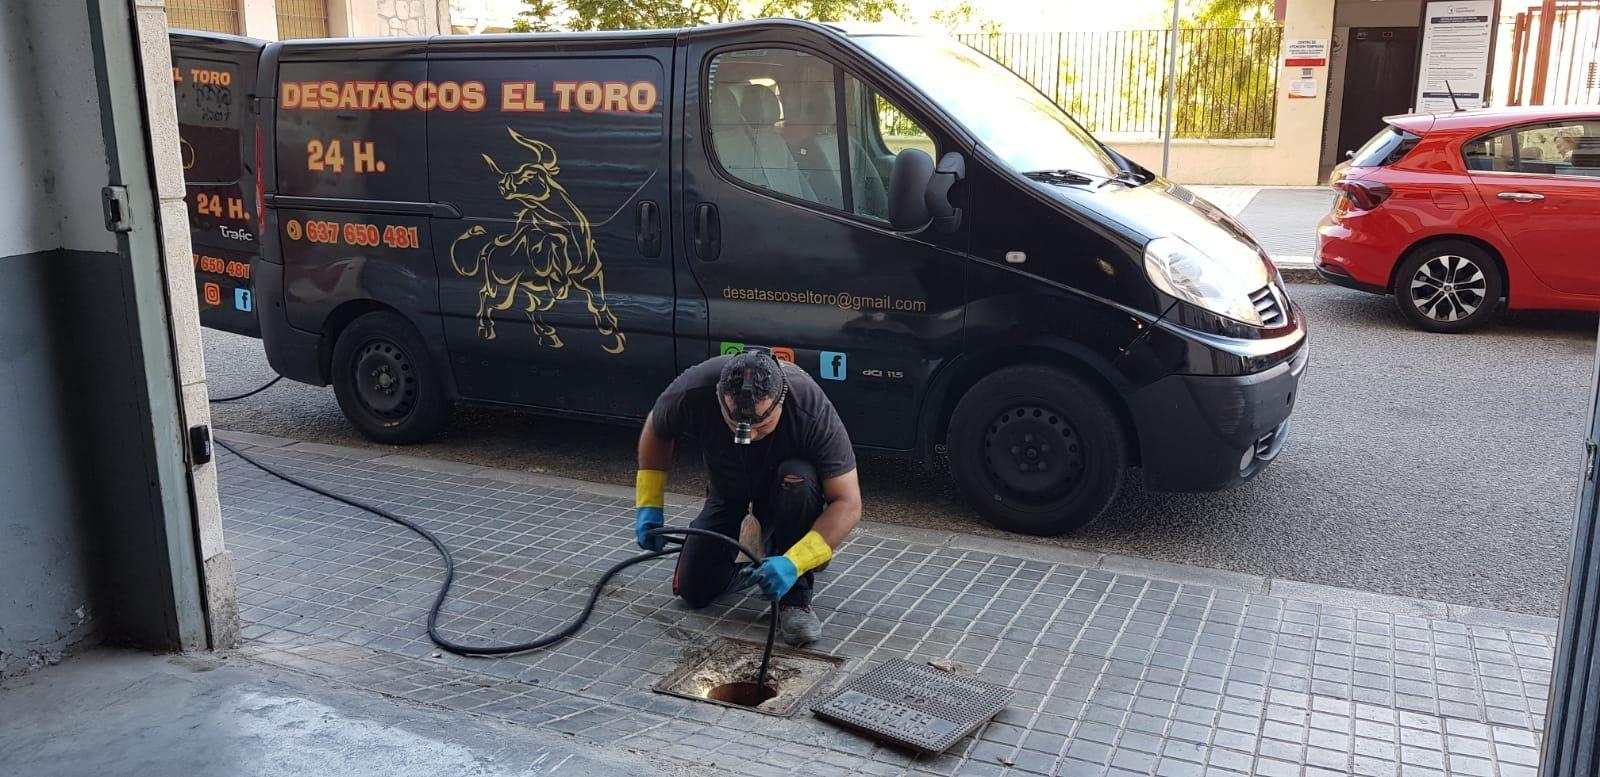 Desatasco en Alicante